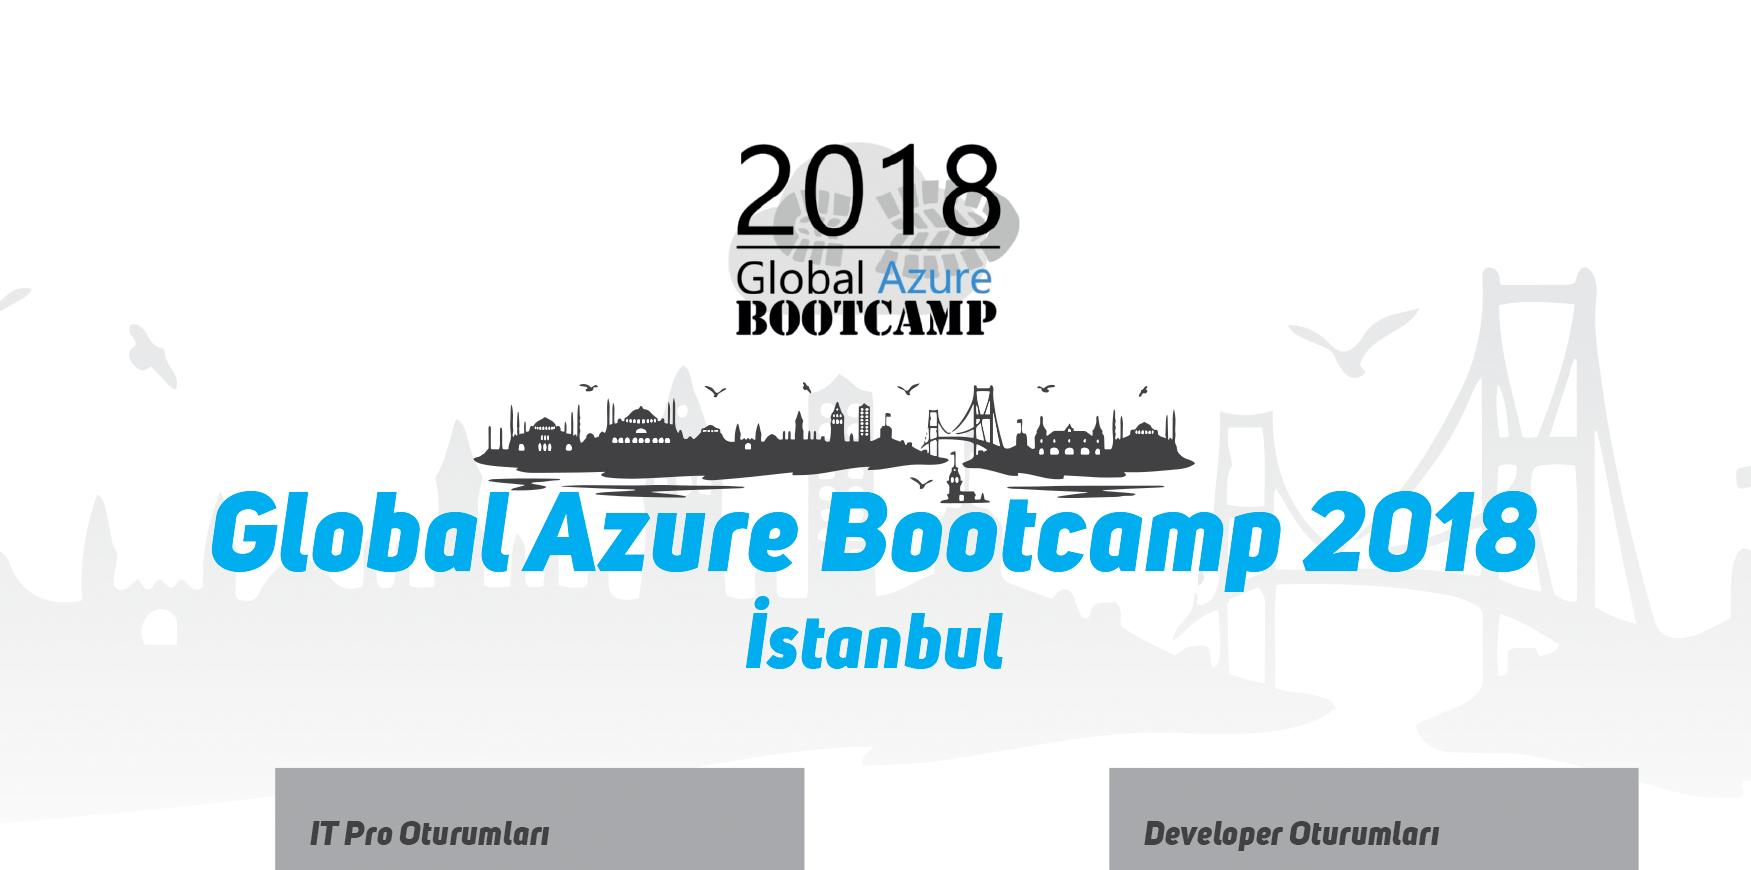 Global Azure Bootcamp 2018, Istanbul/Turkey